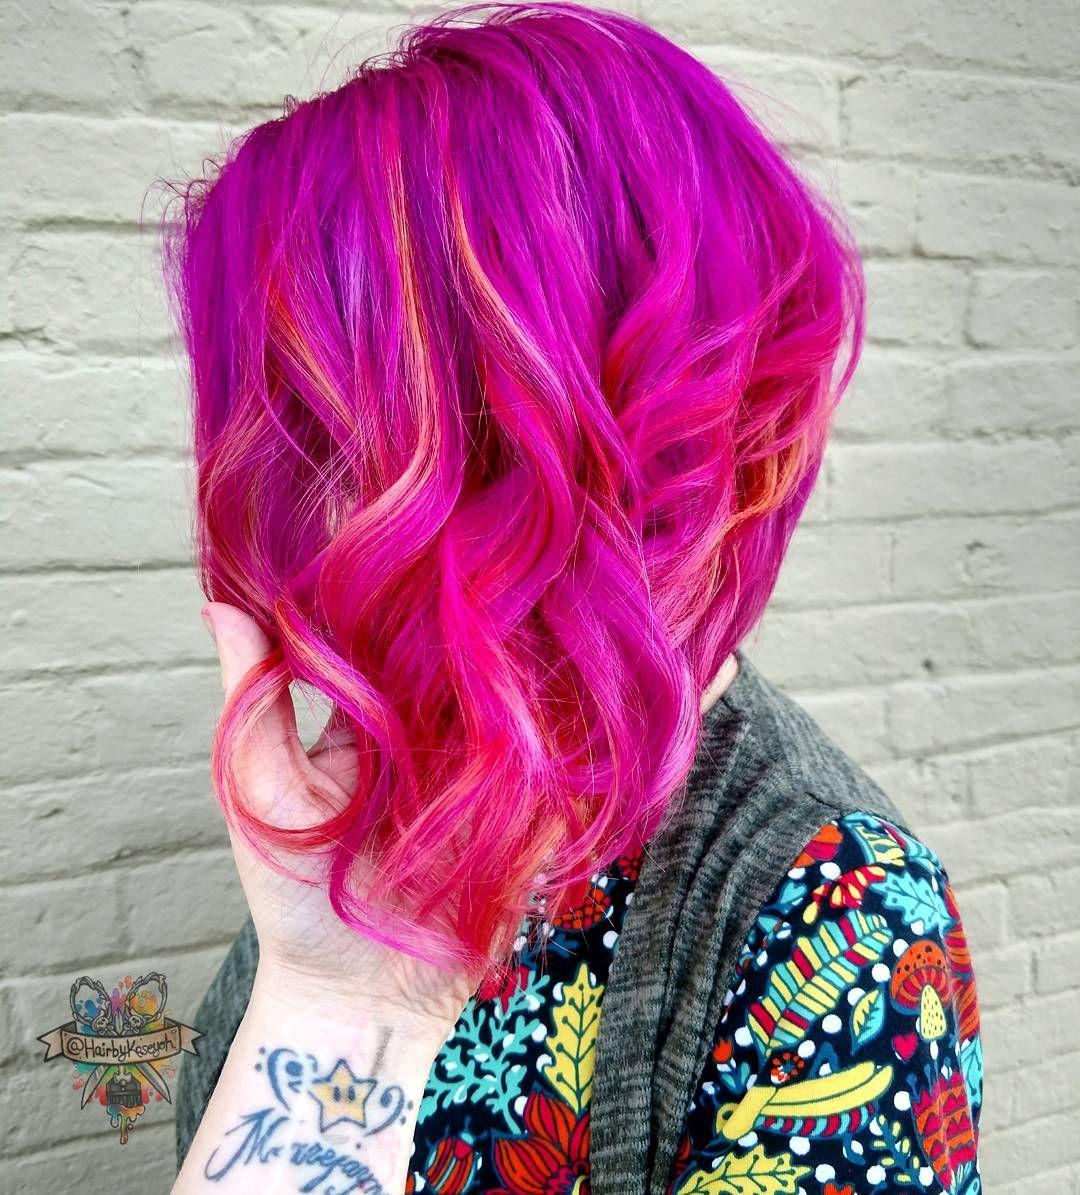 pinke haare haarfarbe inspiration haare pink f rben hairbykaseyoh haarfarben parfum. Black Bedroom Furniture Sets. Home Design Ideas